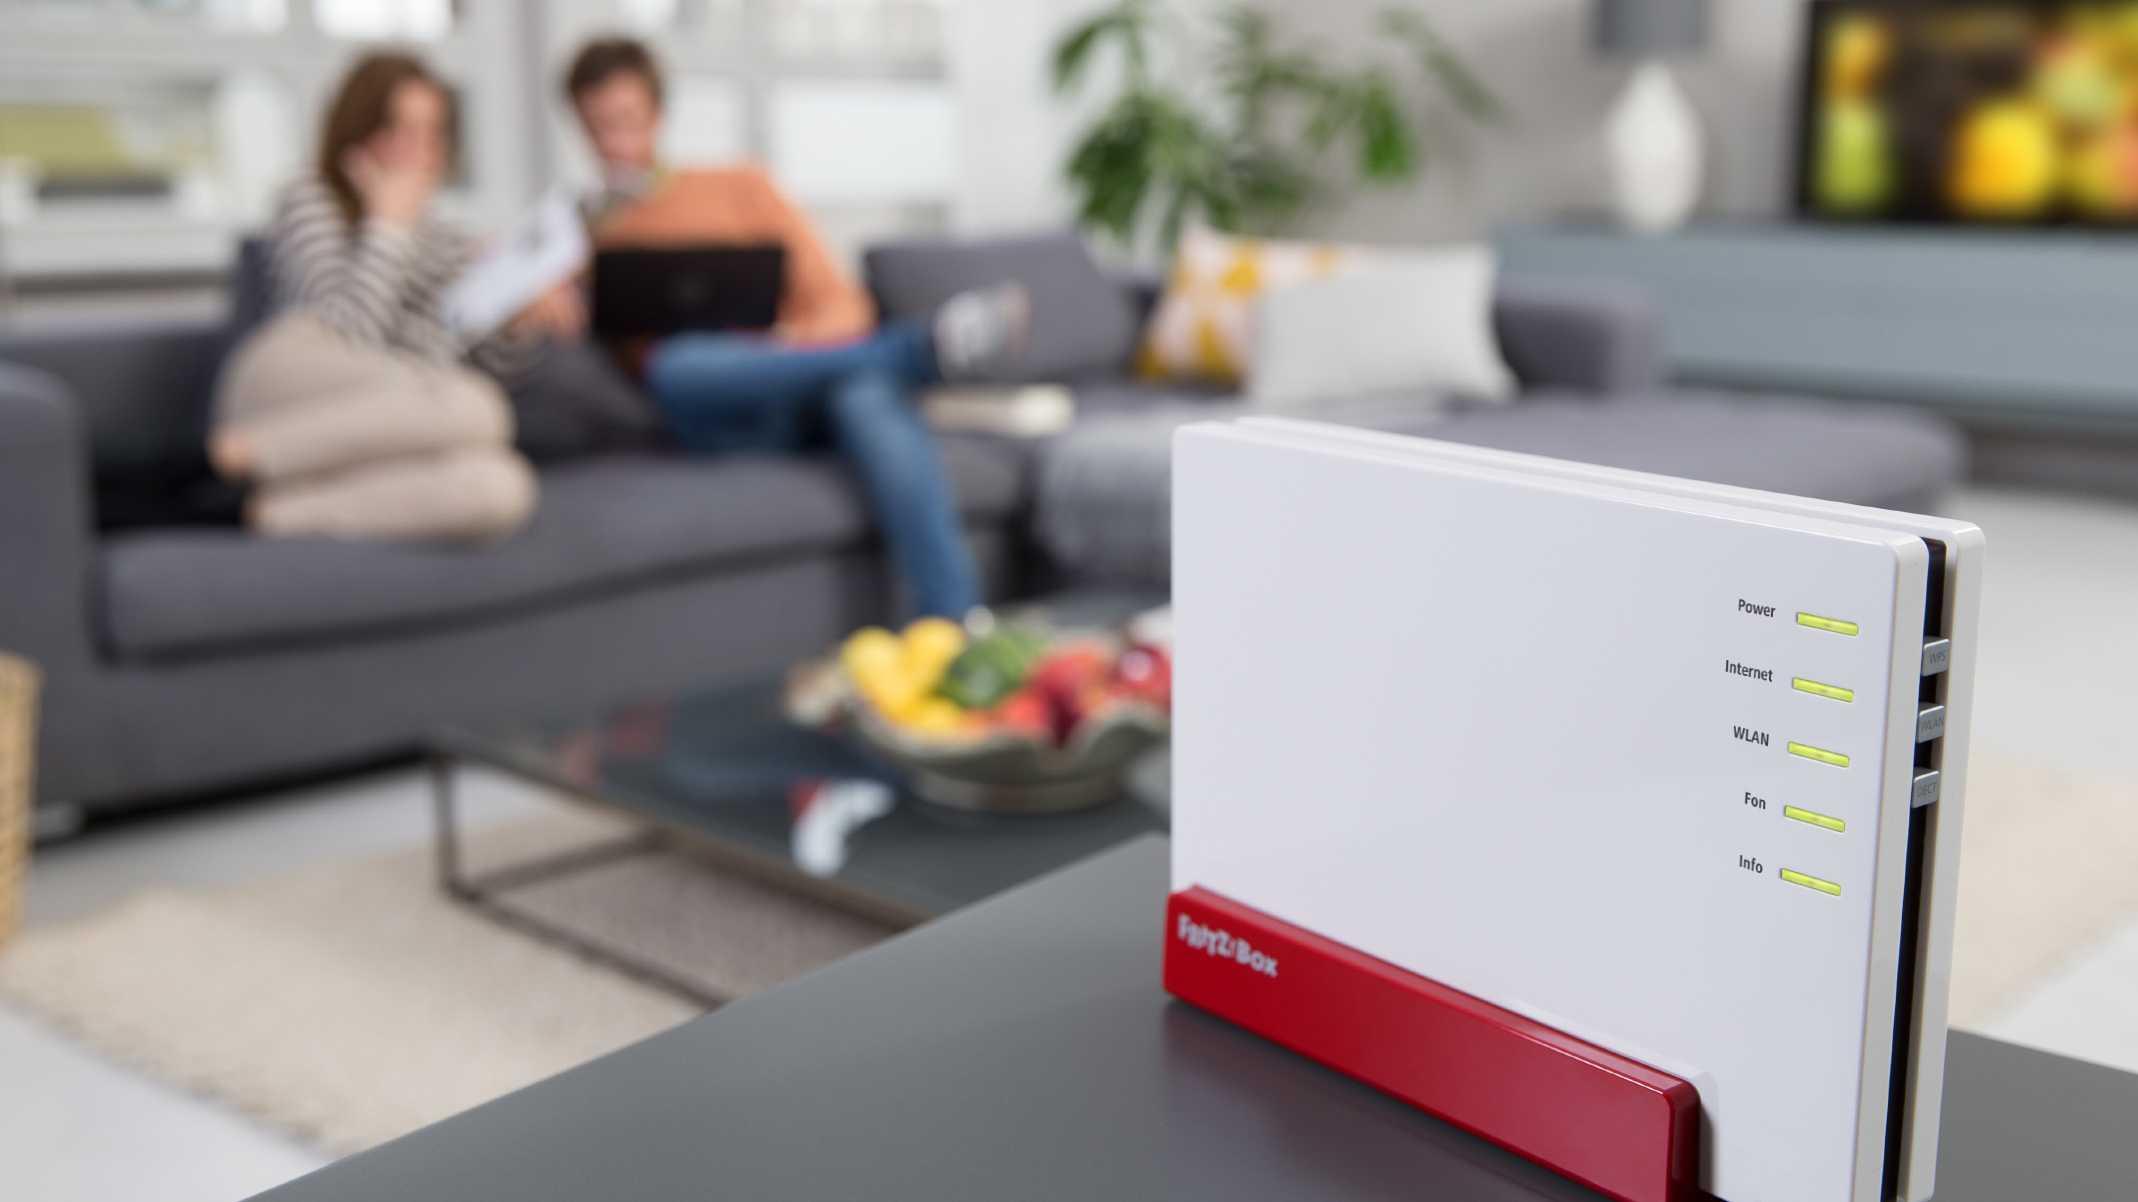 CeBIT: AVM liefert Details zu weiteren neuen Fritzboxen